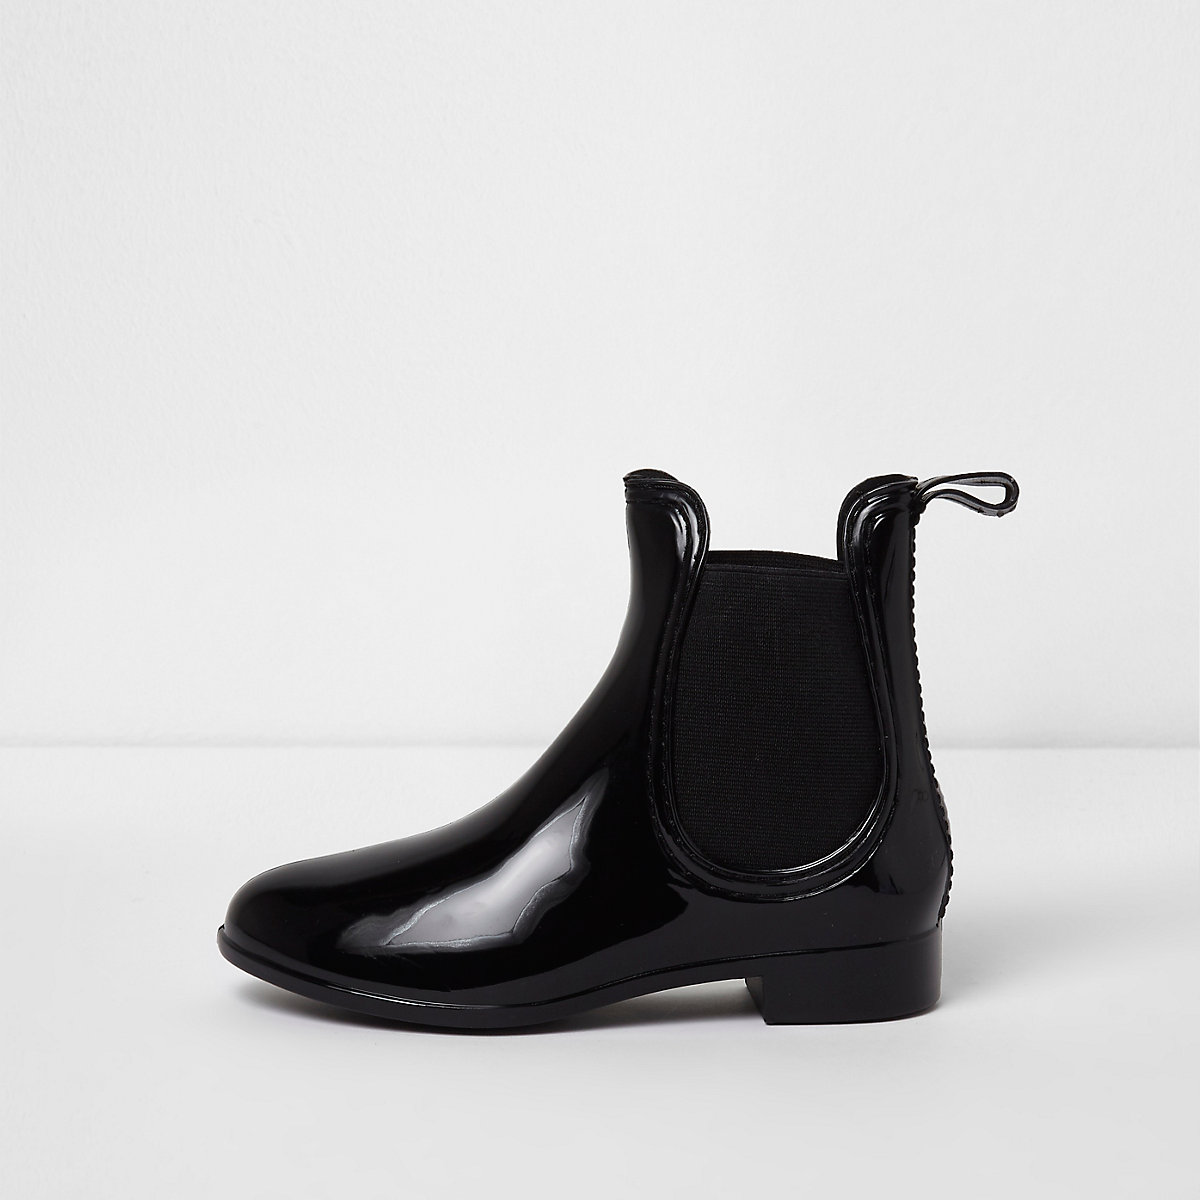 Girls black patent chelsea boot wellies